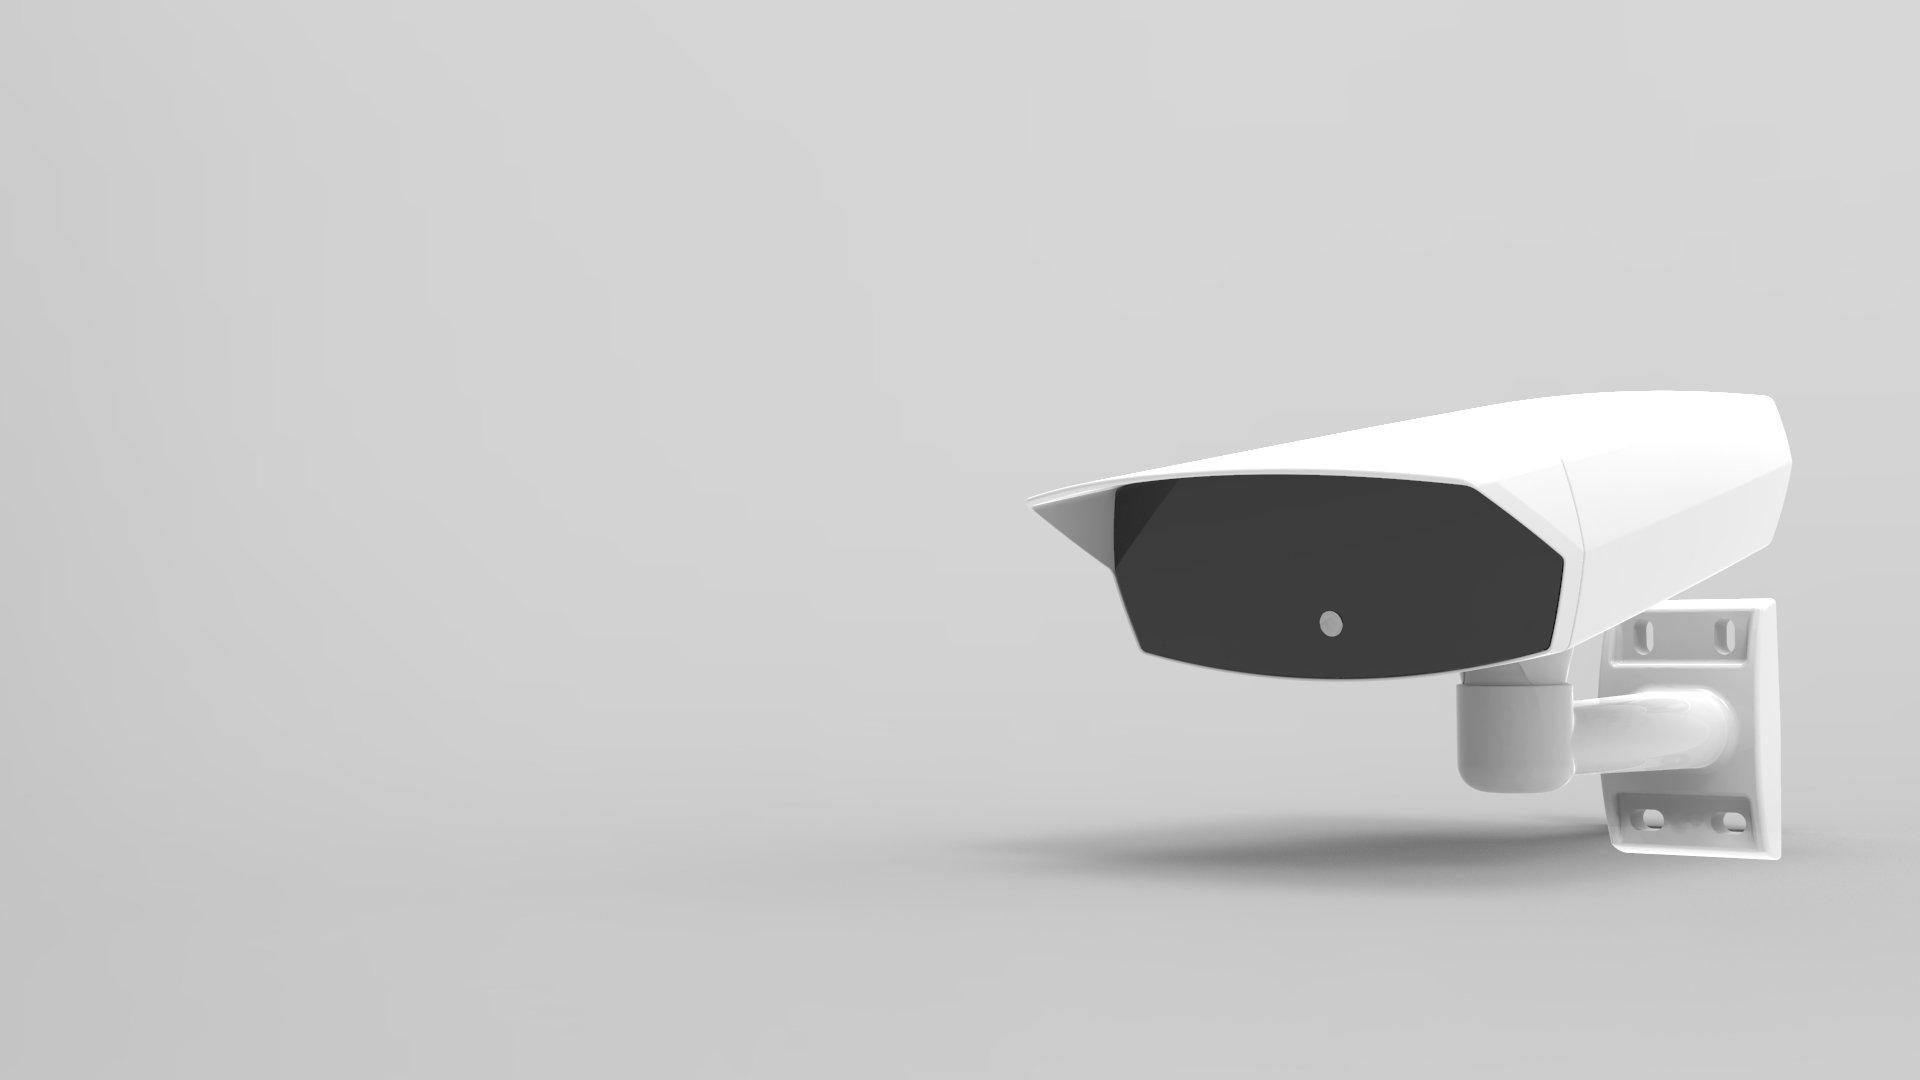 IoT camera